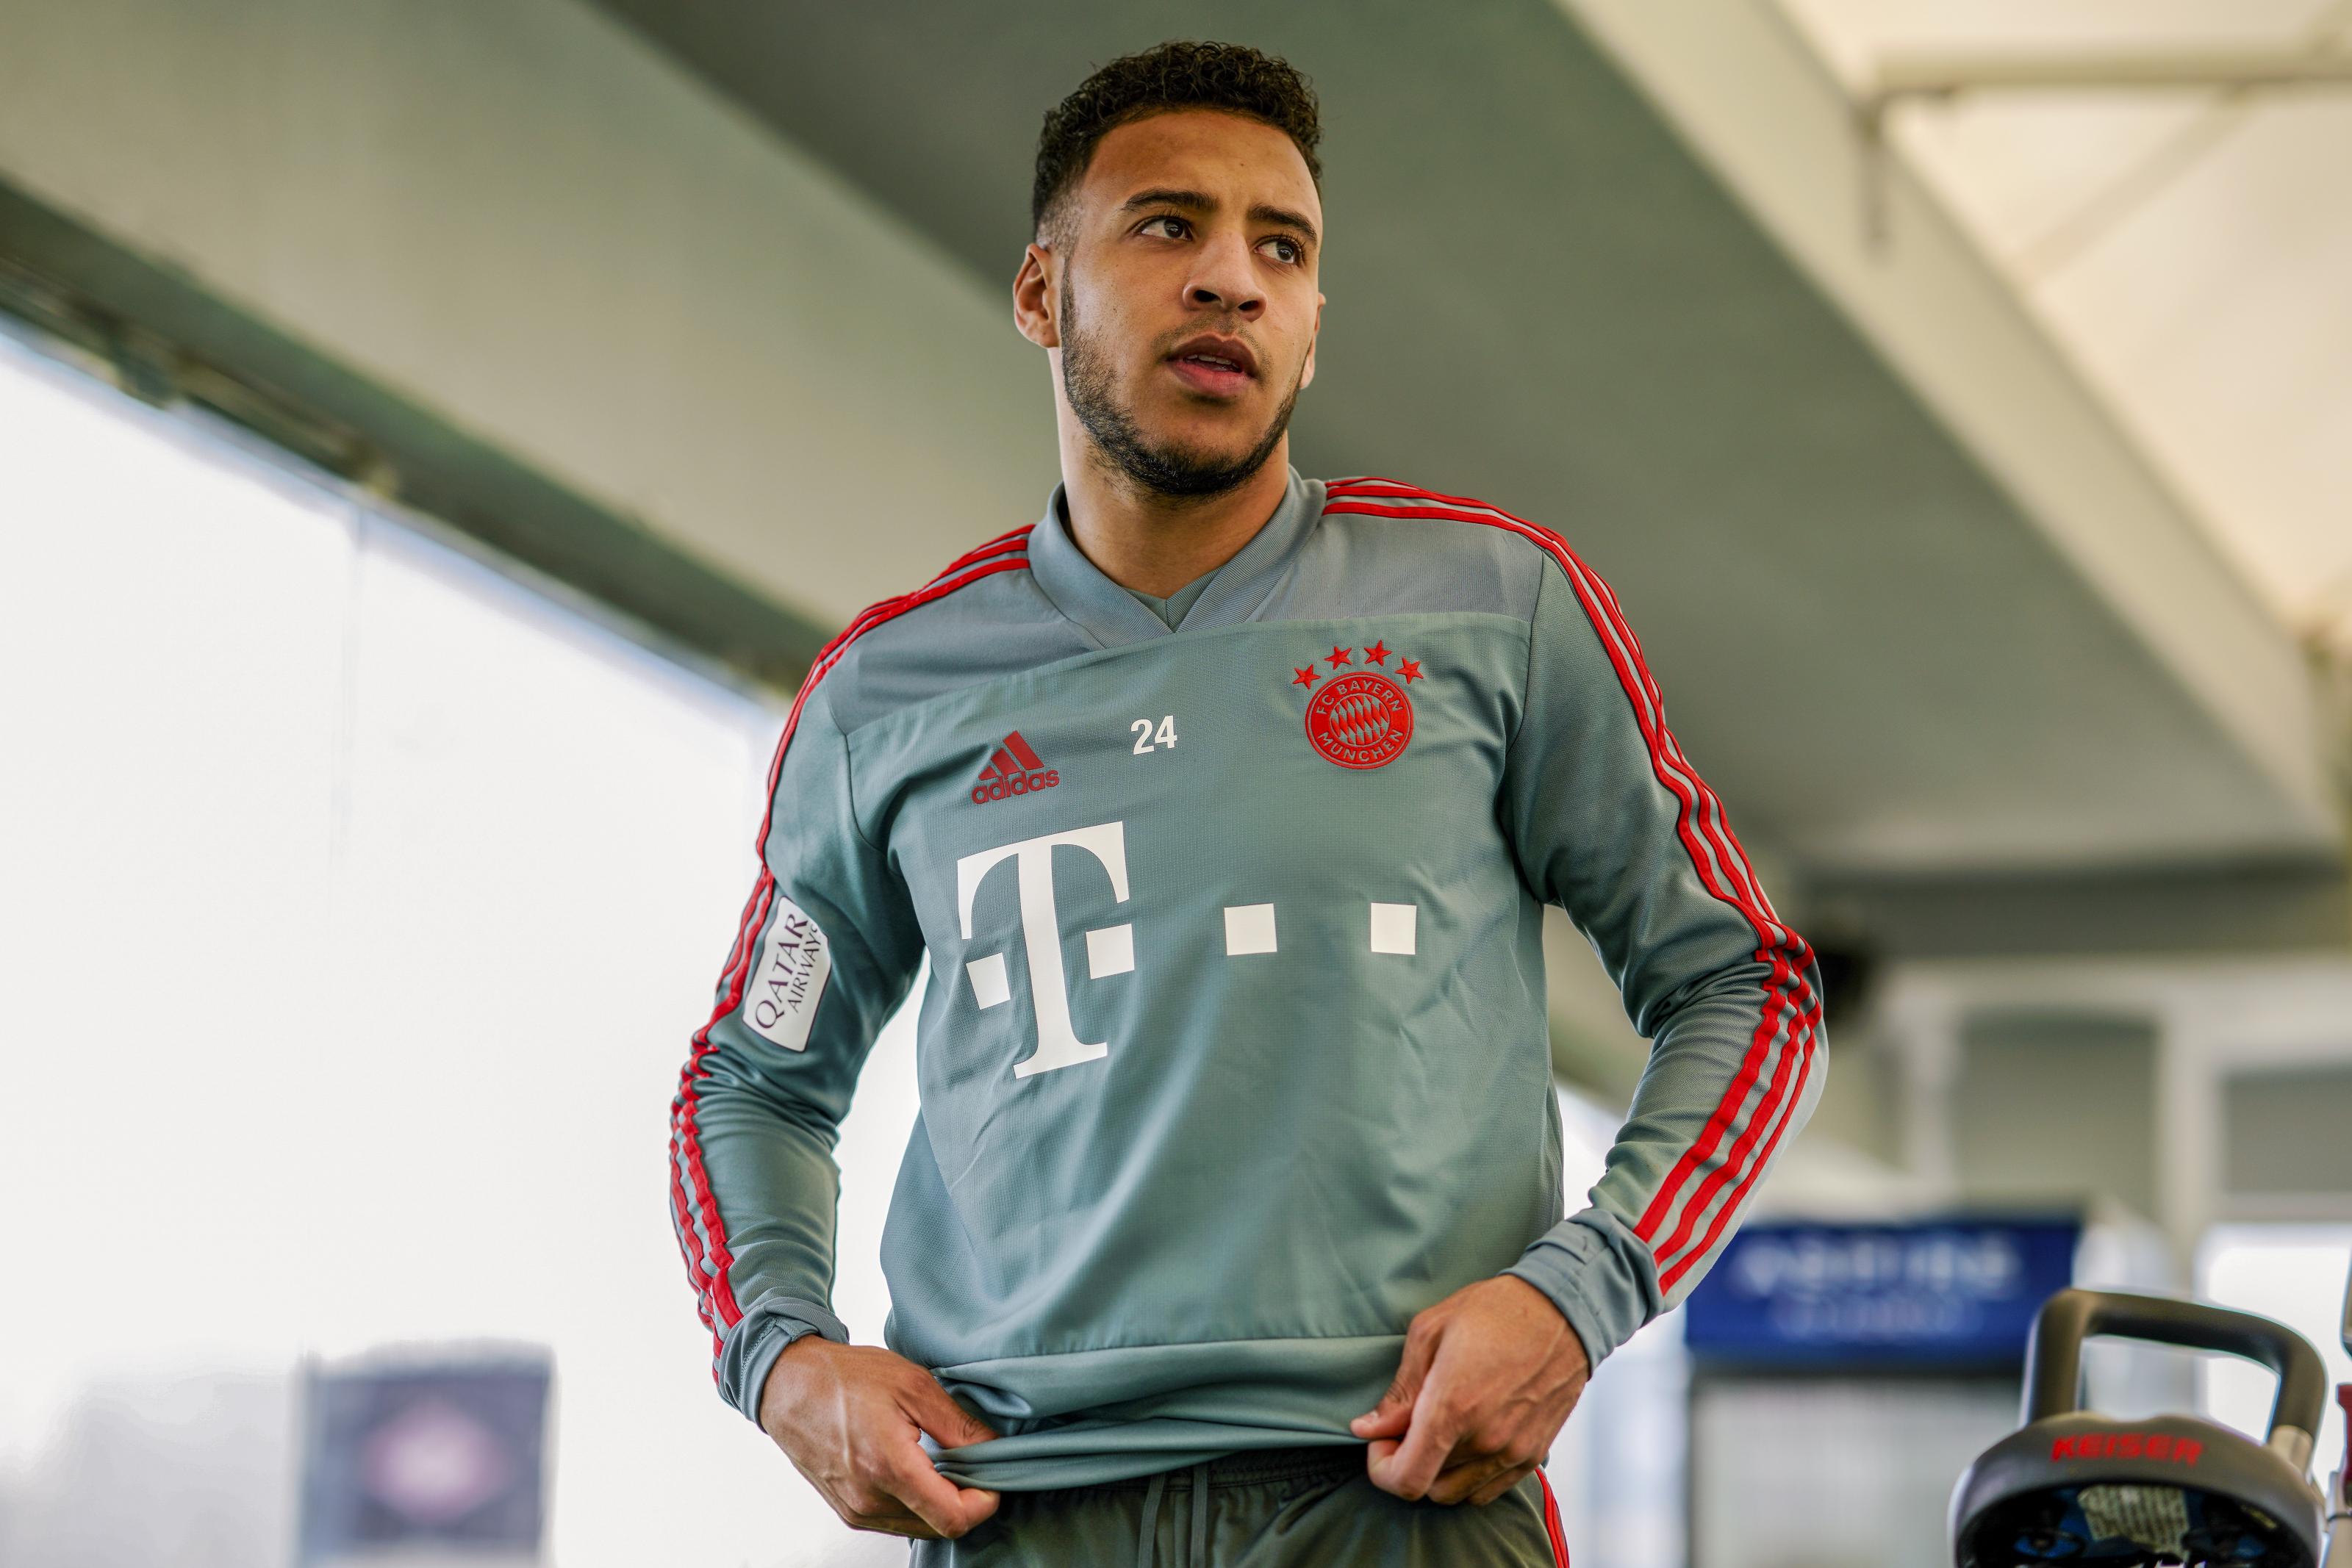 Bayern Tolisso